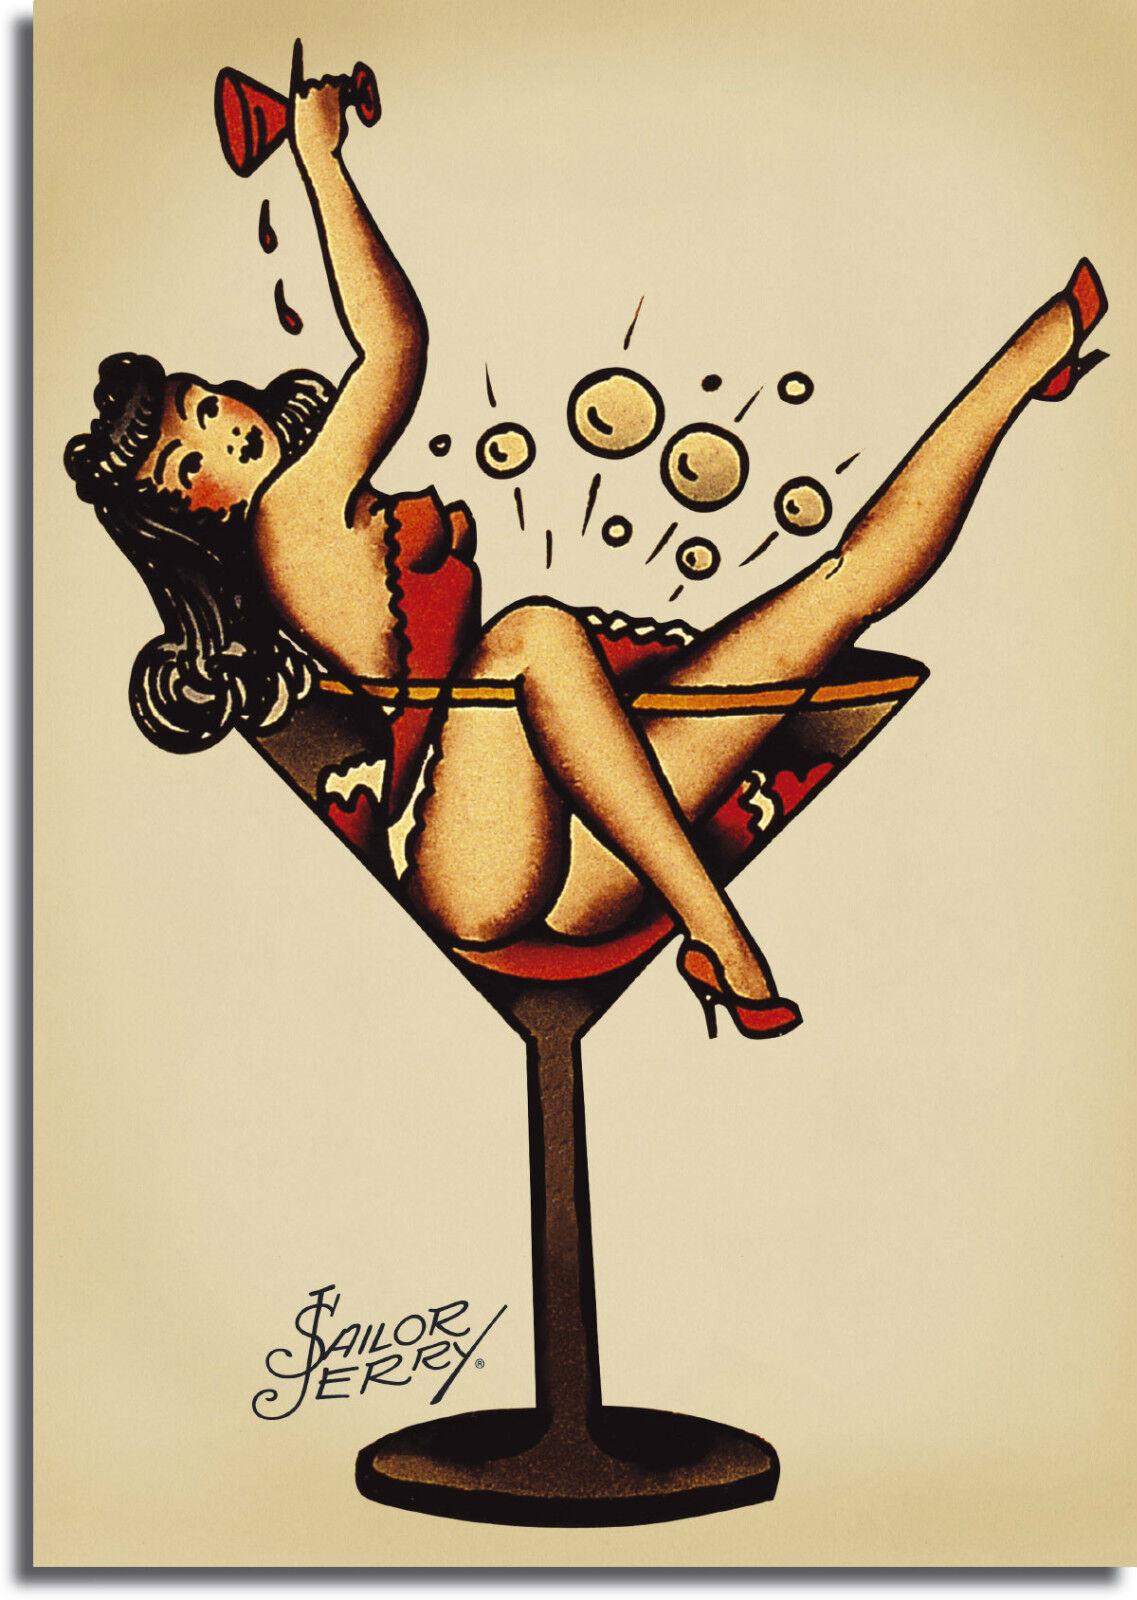 Sailor Jerry Pin Up Girl Tatto Vintage Giant CANVAS PRINT - A0 A1 A2 A3 A4 Größes